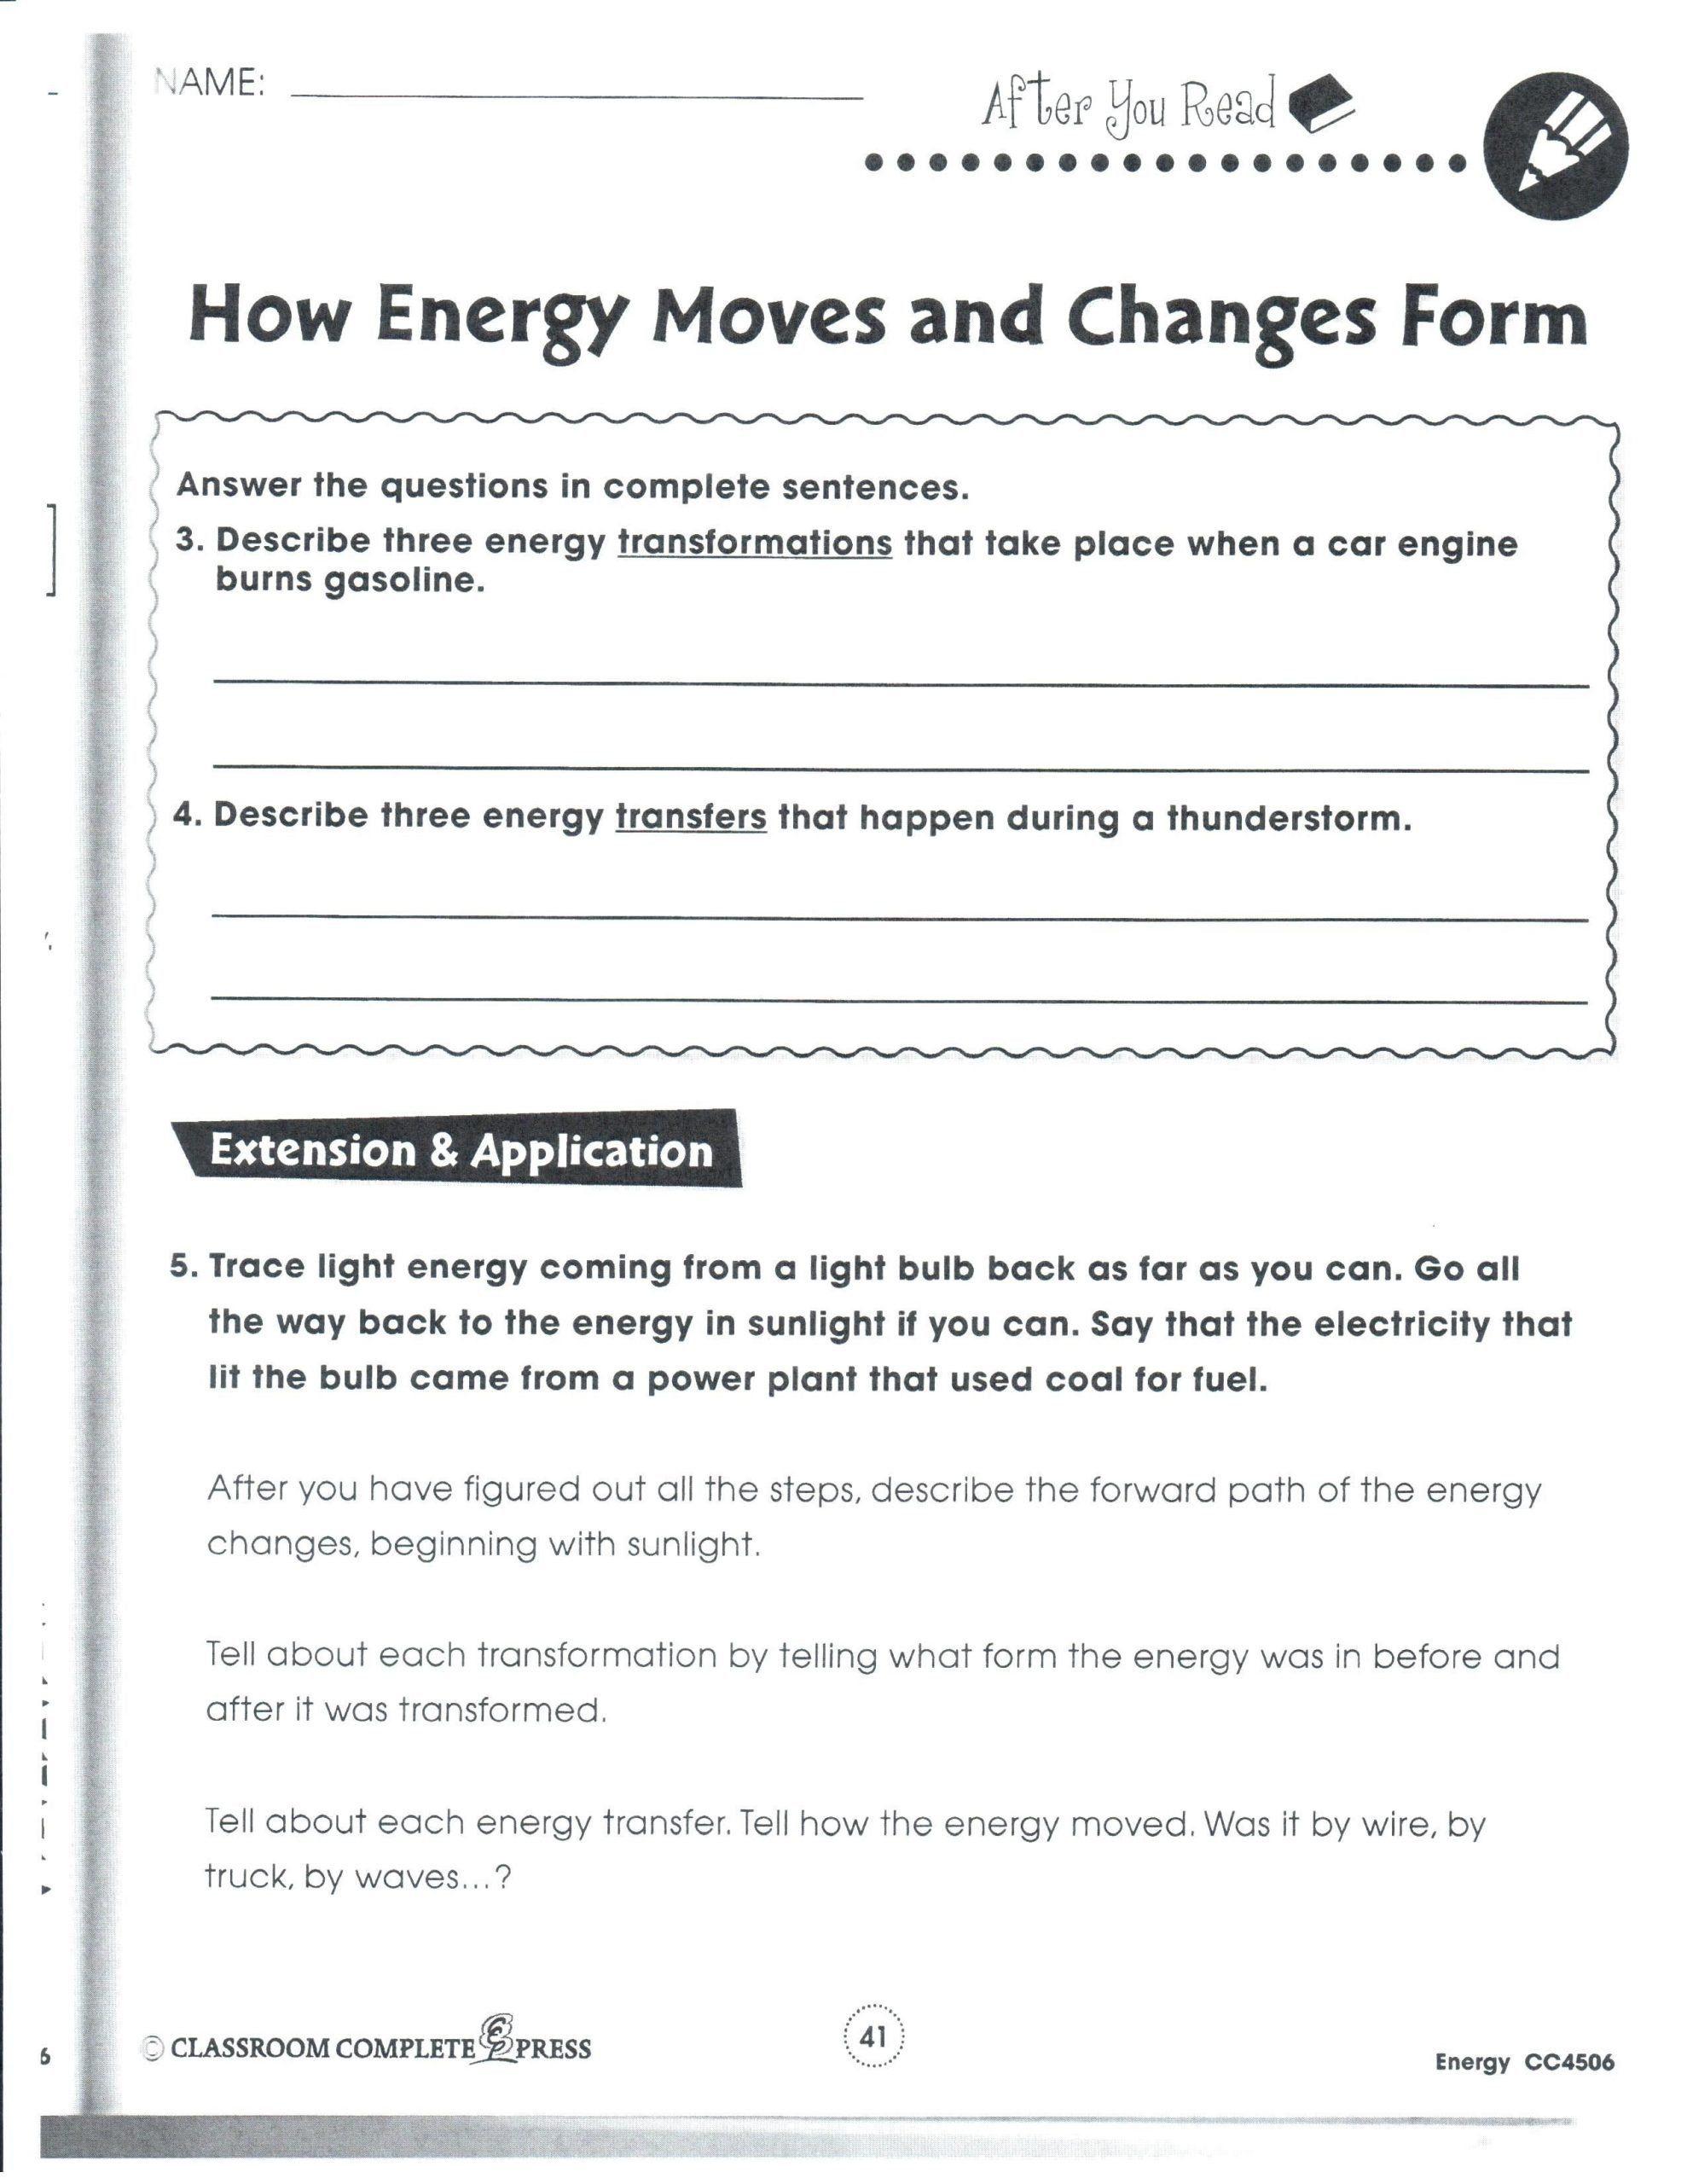 Energy transformation worksheet middle school linear